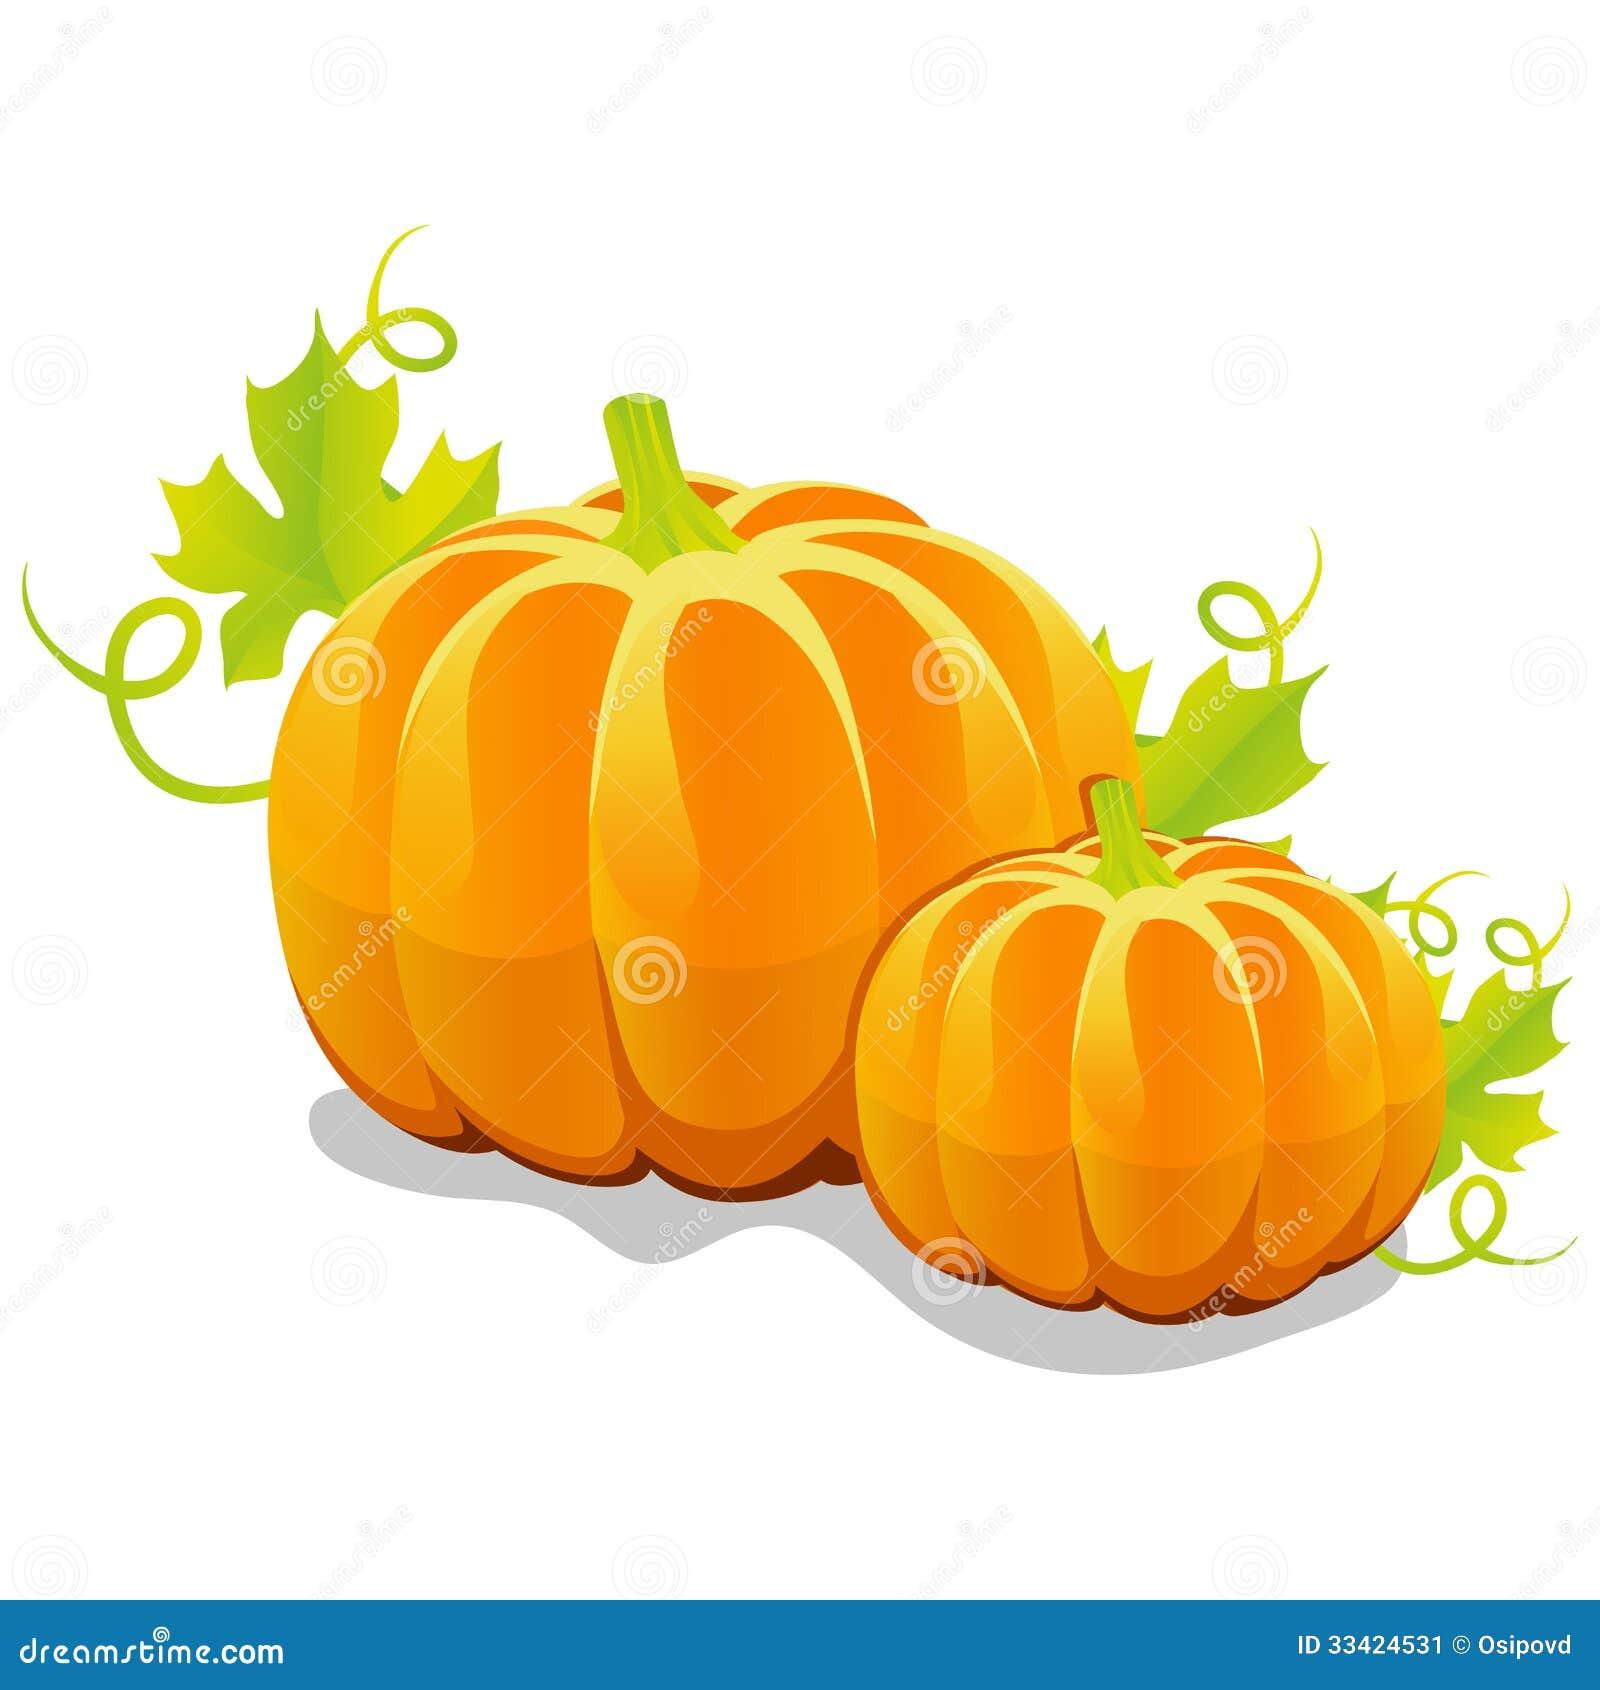 Two vector pumpkin stock vector. Illustration of natural - 33424531